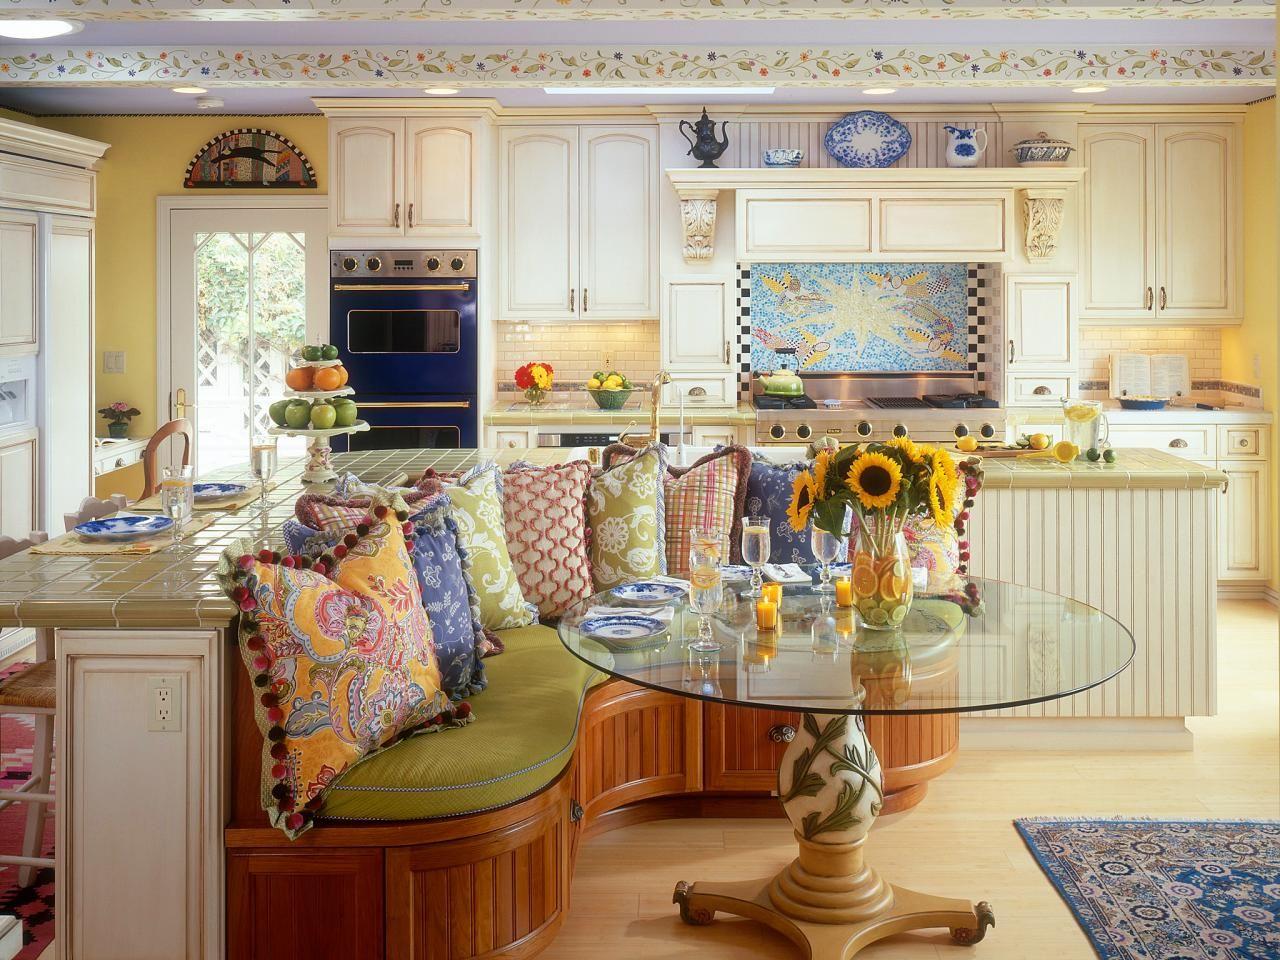 30 Colorful Kitchen Design Ideas From   kitchen envy   Pinterest ...